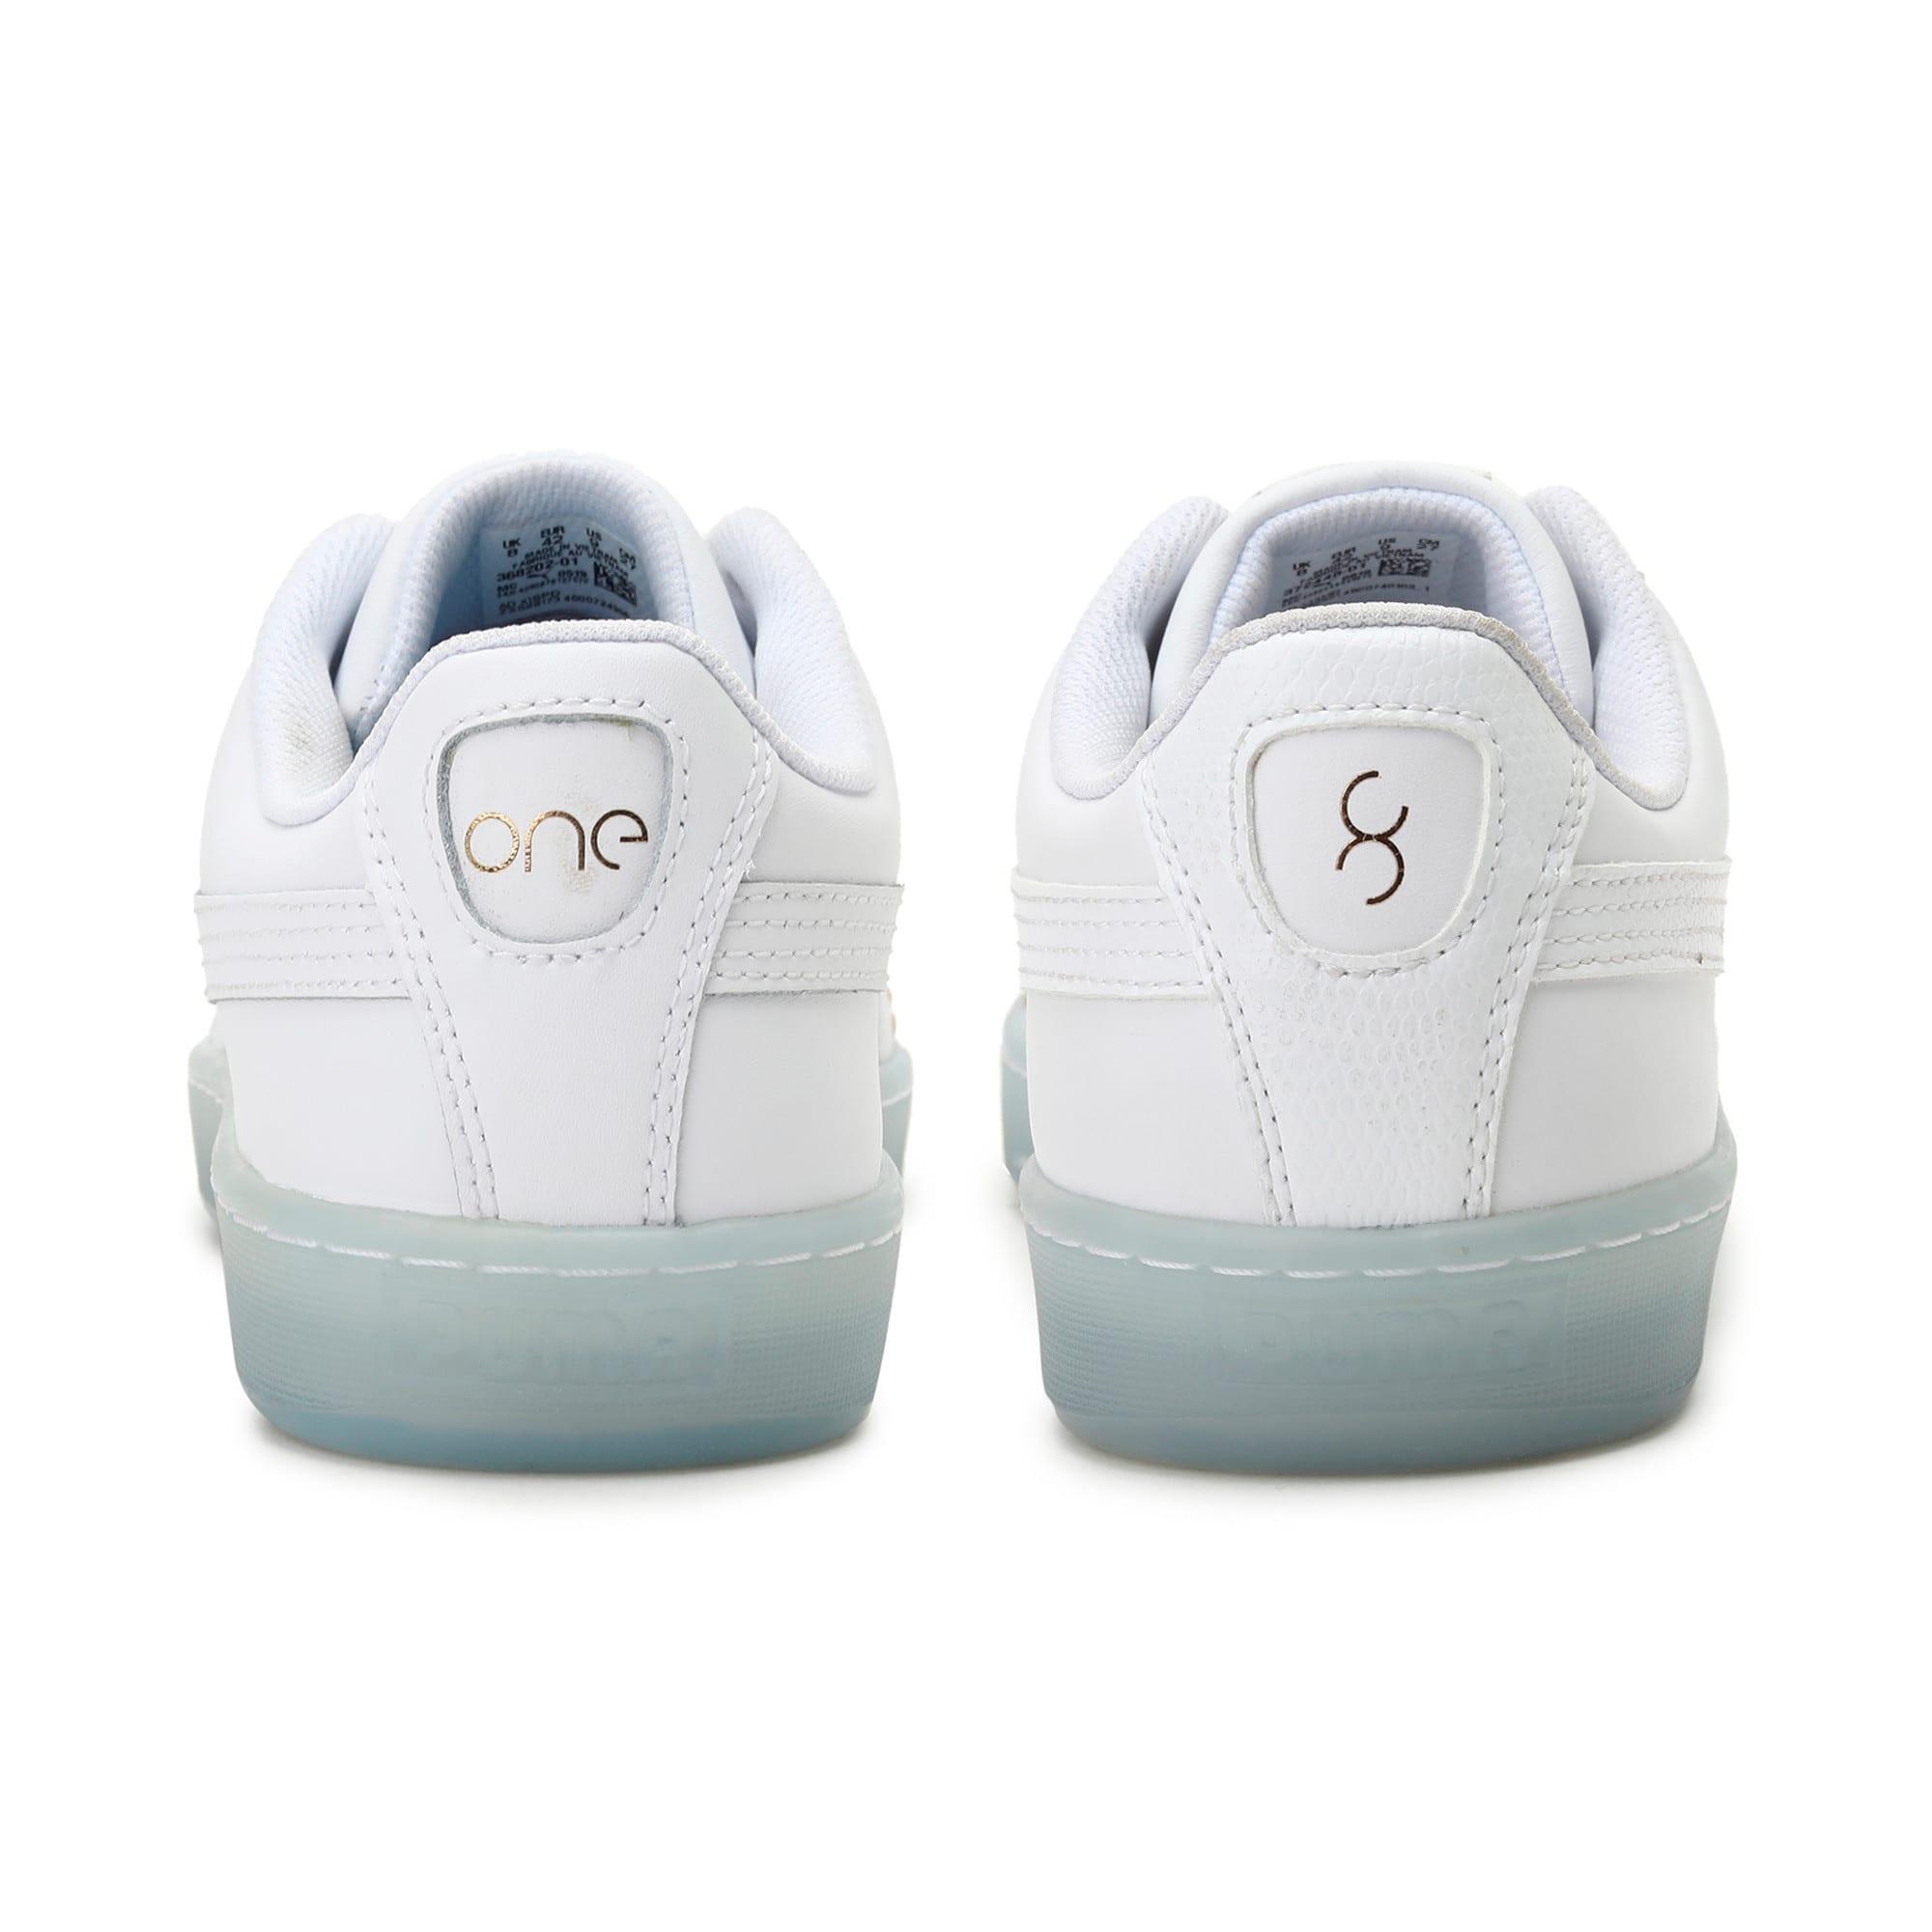 Thumbnail 3 of Basket Classic one8 Unisex Sneakers, White-Team Gold-Bleu Azur, medium-IND